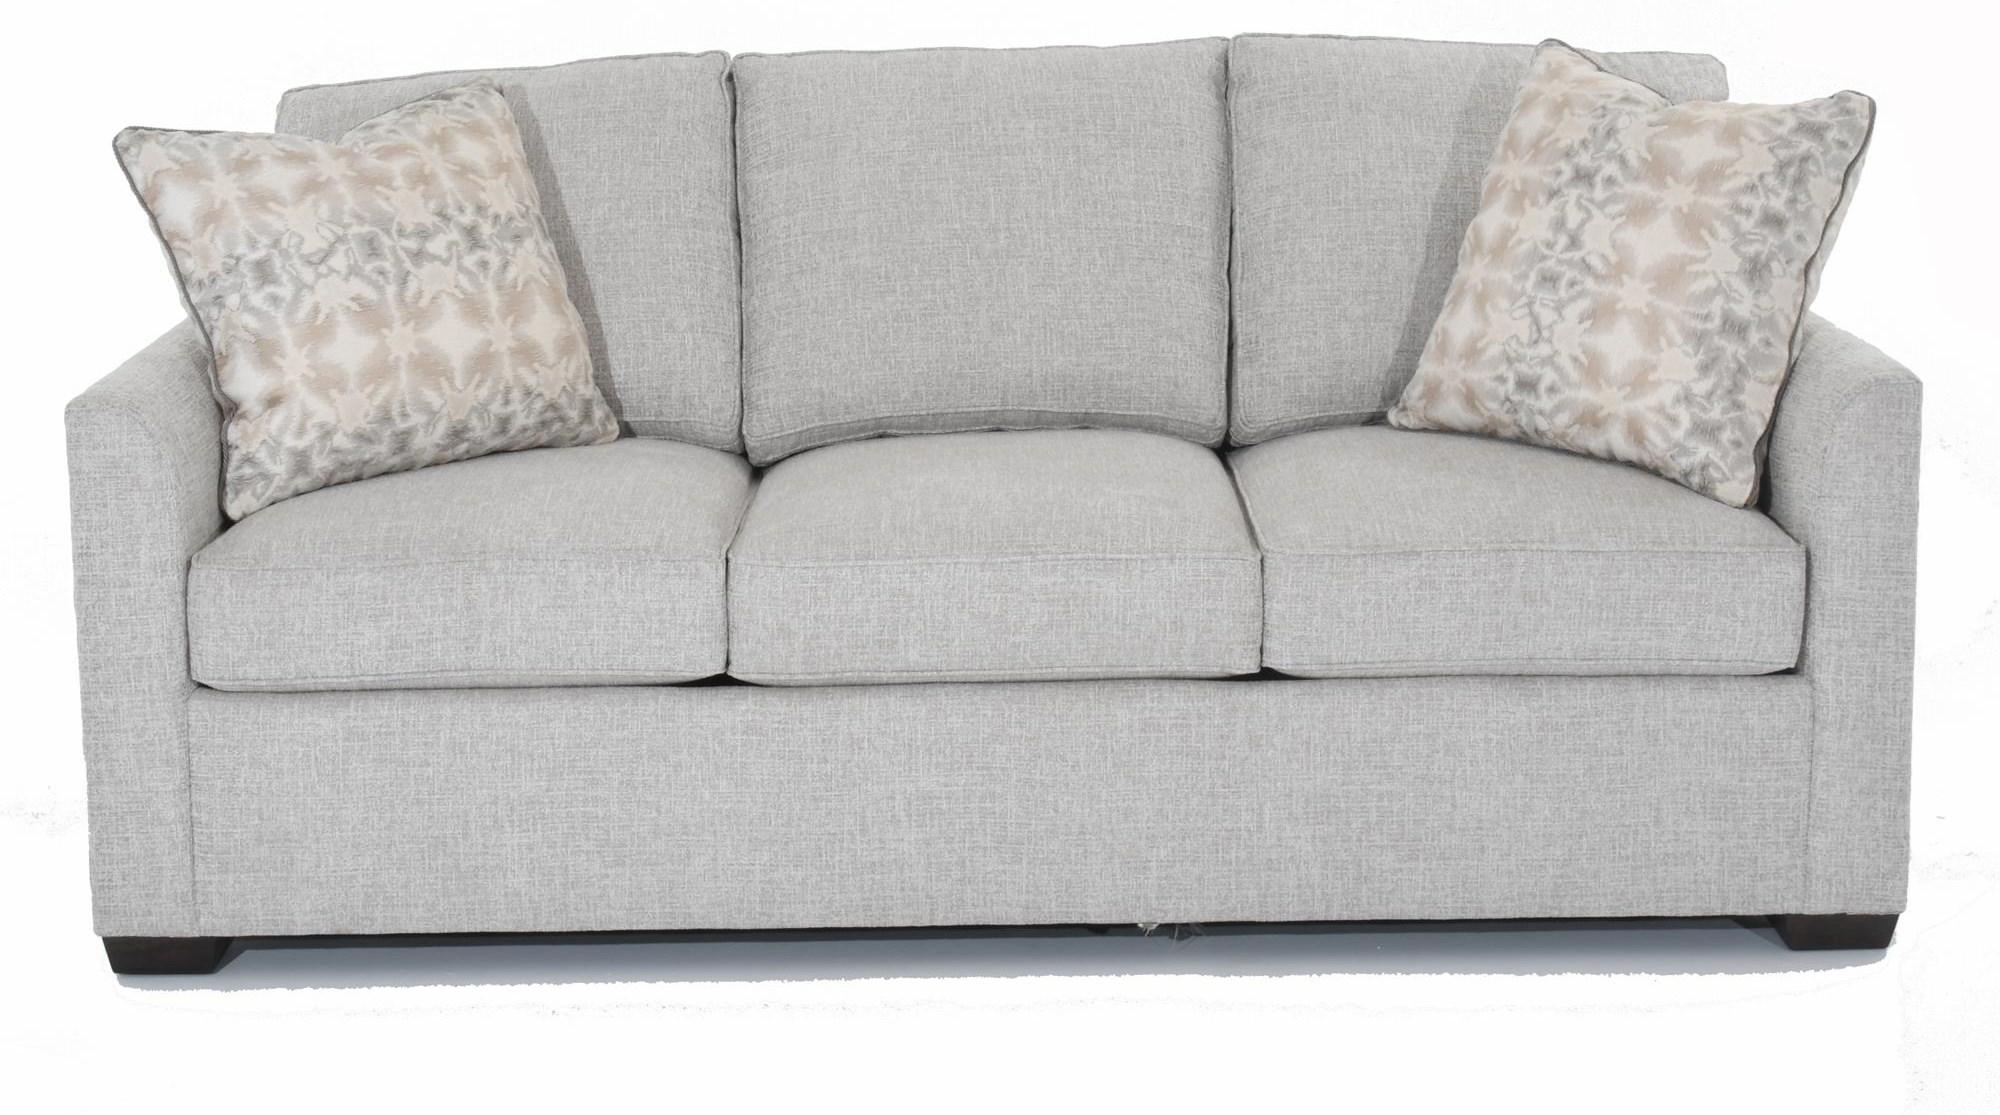 "Simplicity 84"" Tuxedo Arm Sleeper Sofa by Huntington House at Baer's Furniture"